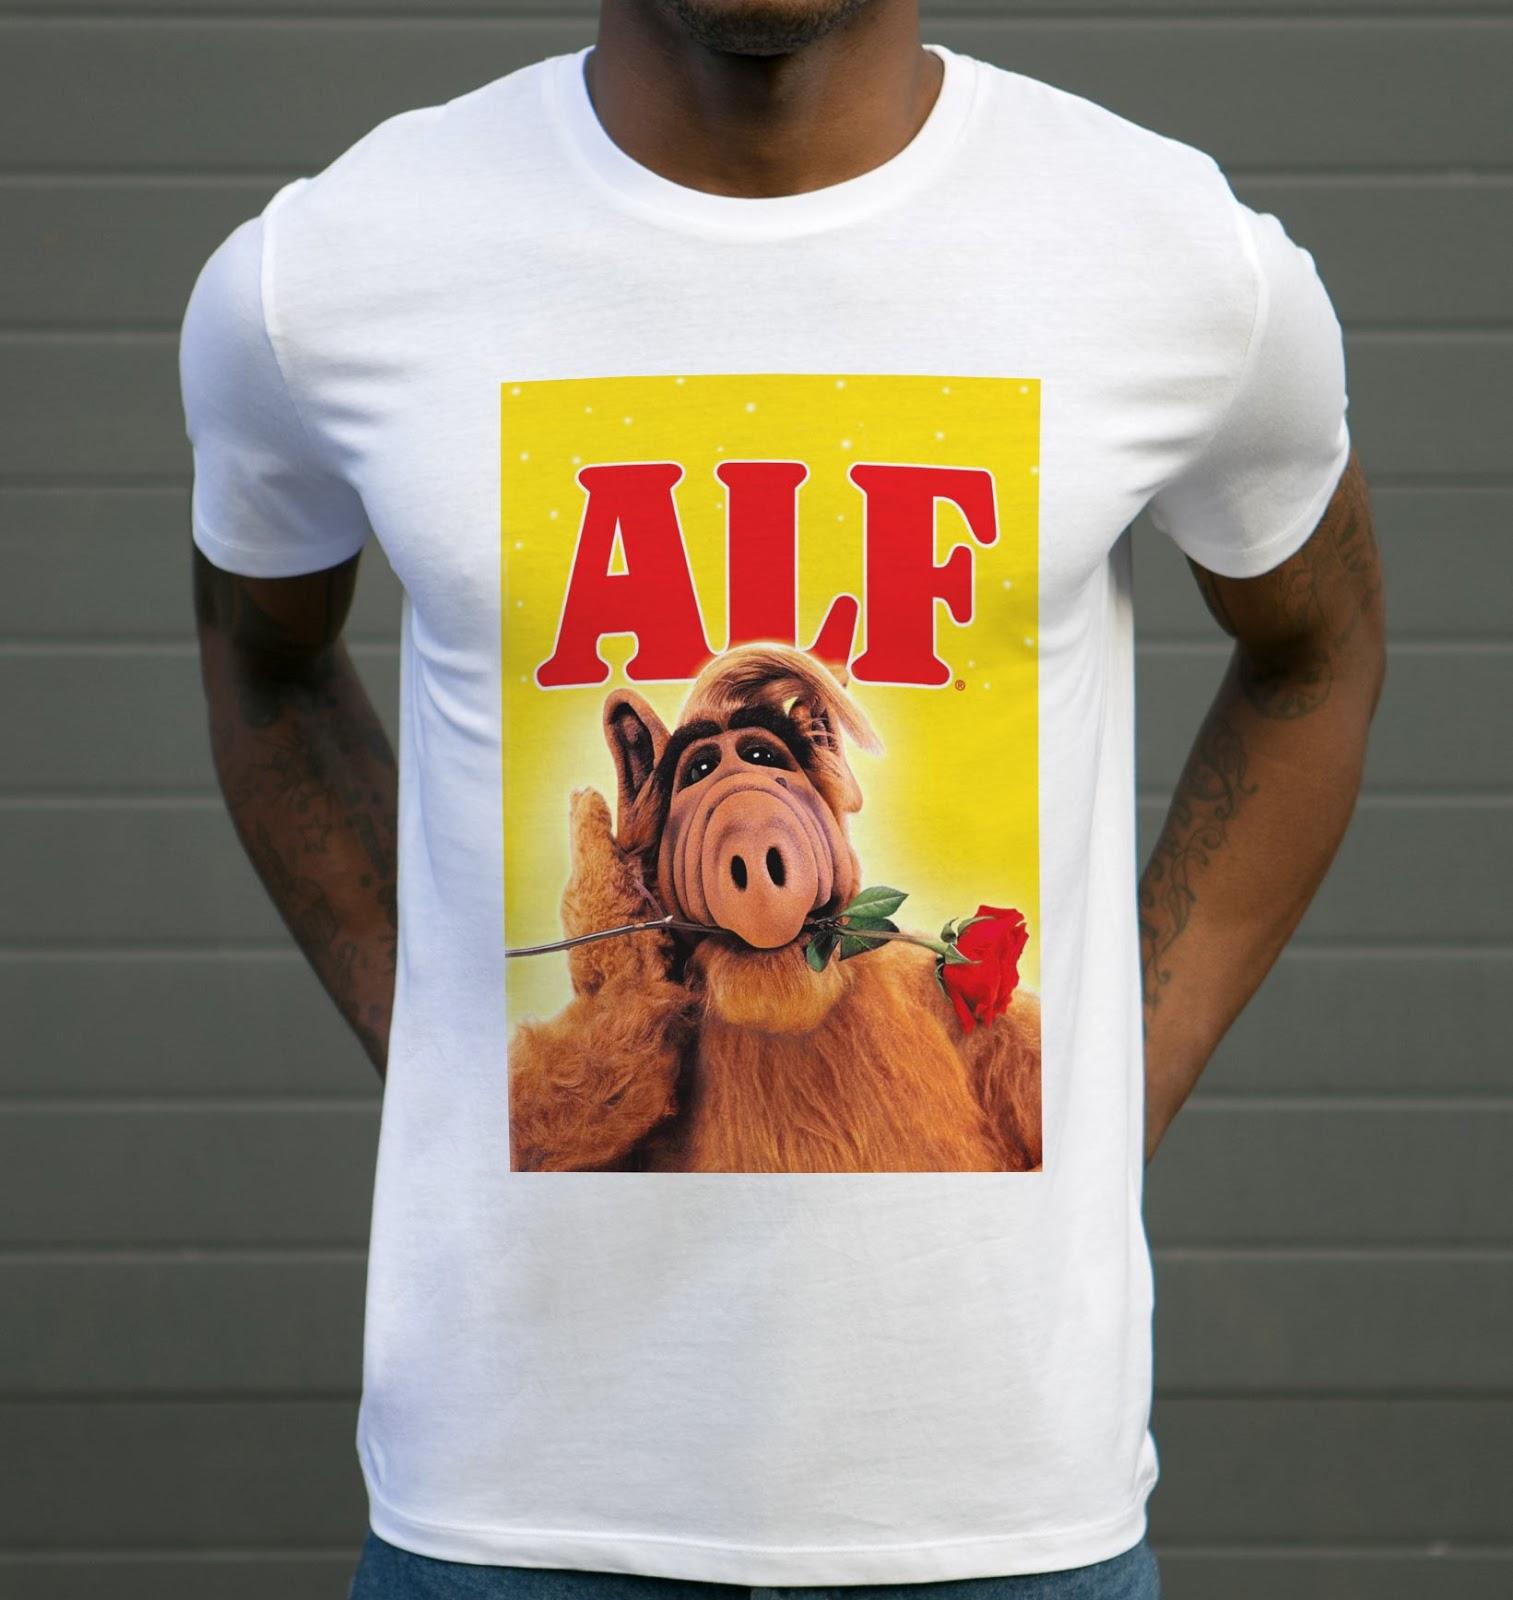 https://grafitee.co/tshirts/gordon-shumway-t-shirt